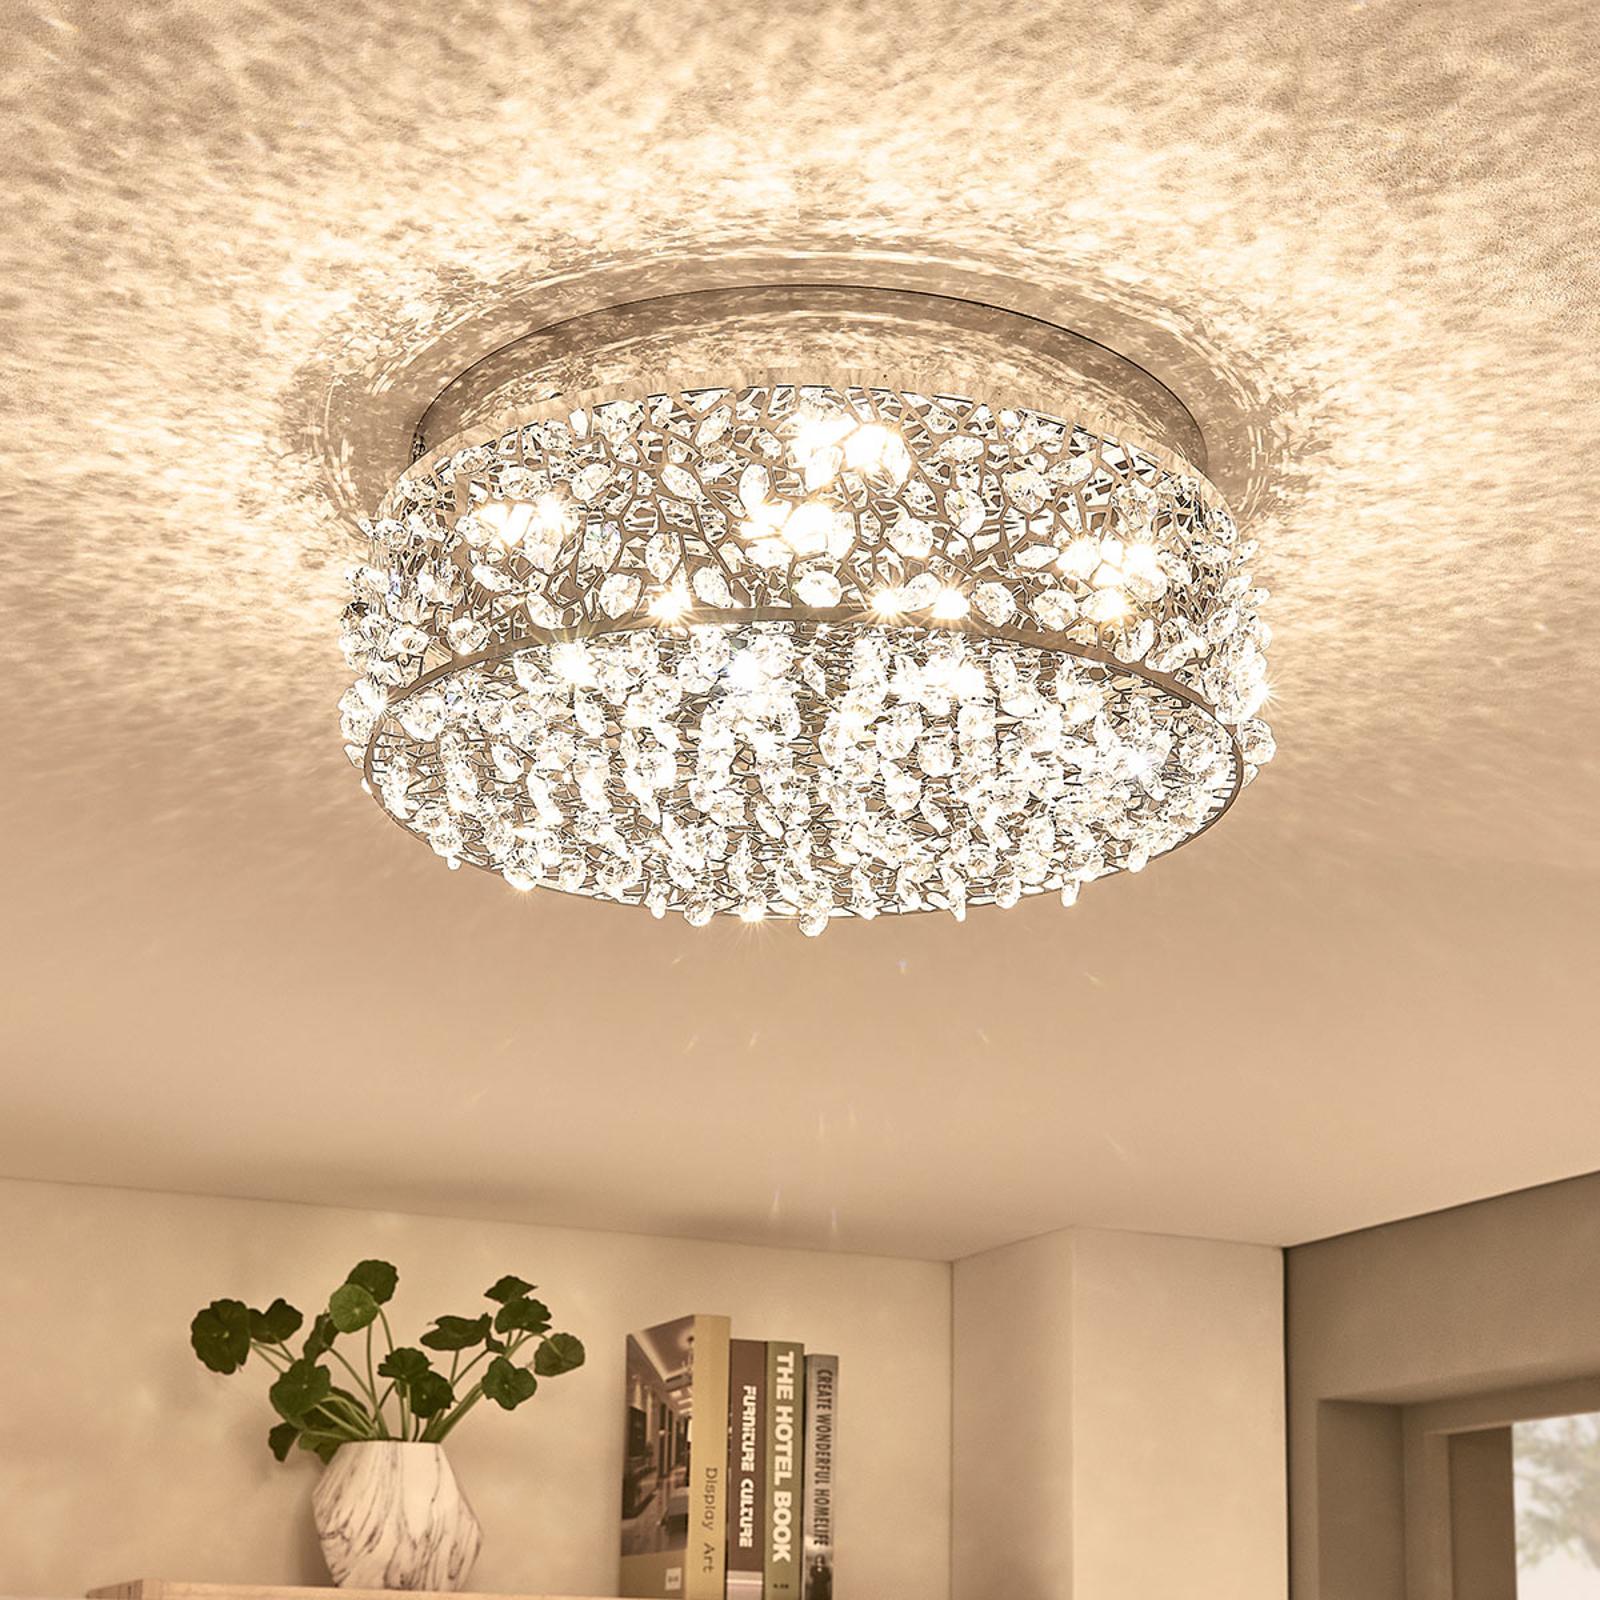 Strålende LED-taklampe Felias, rund form